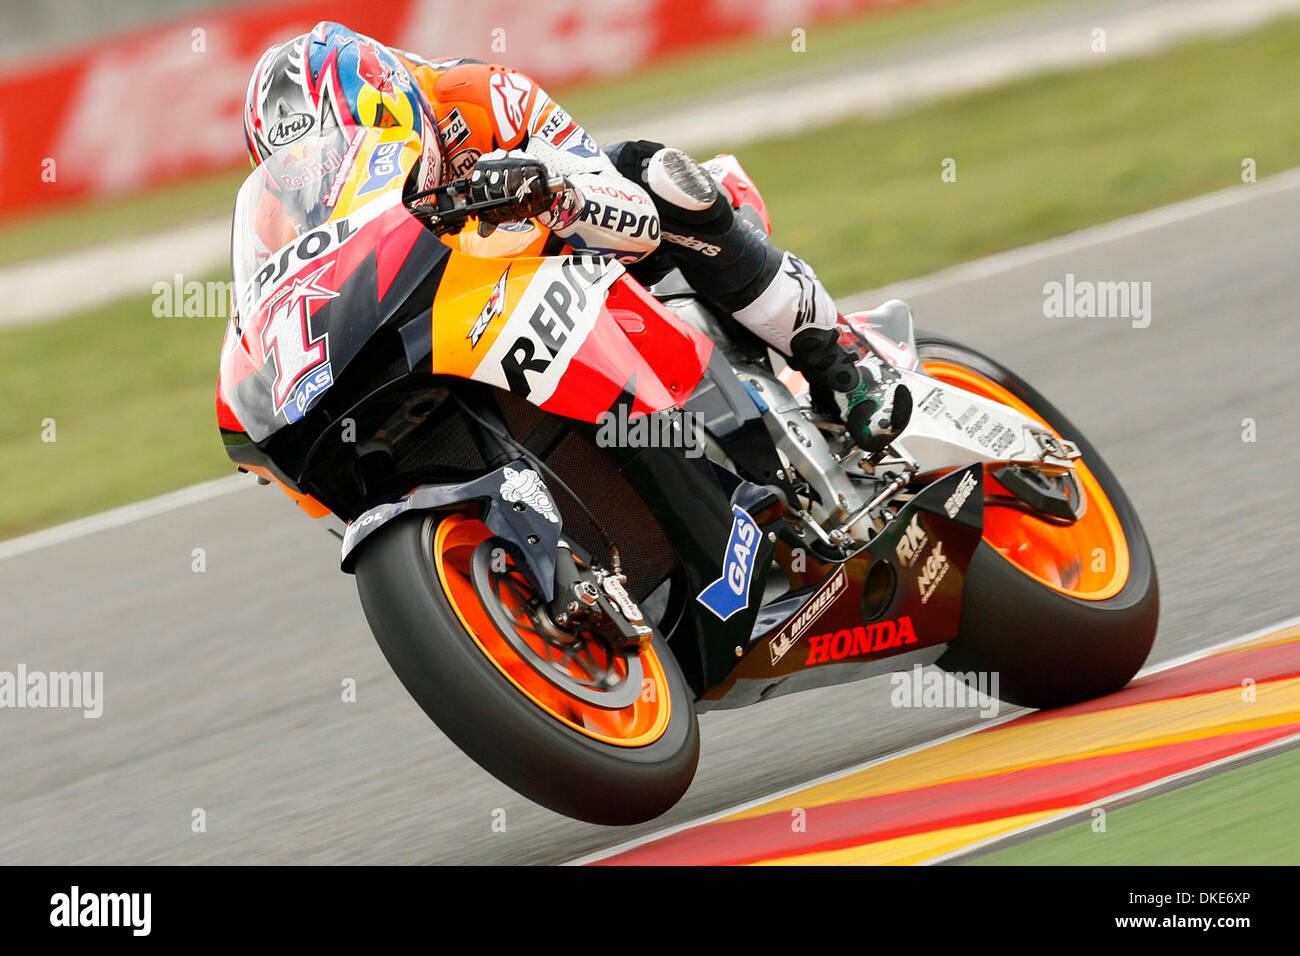 moto de sport prix